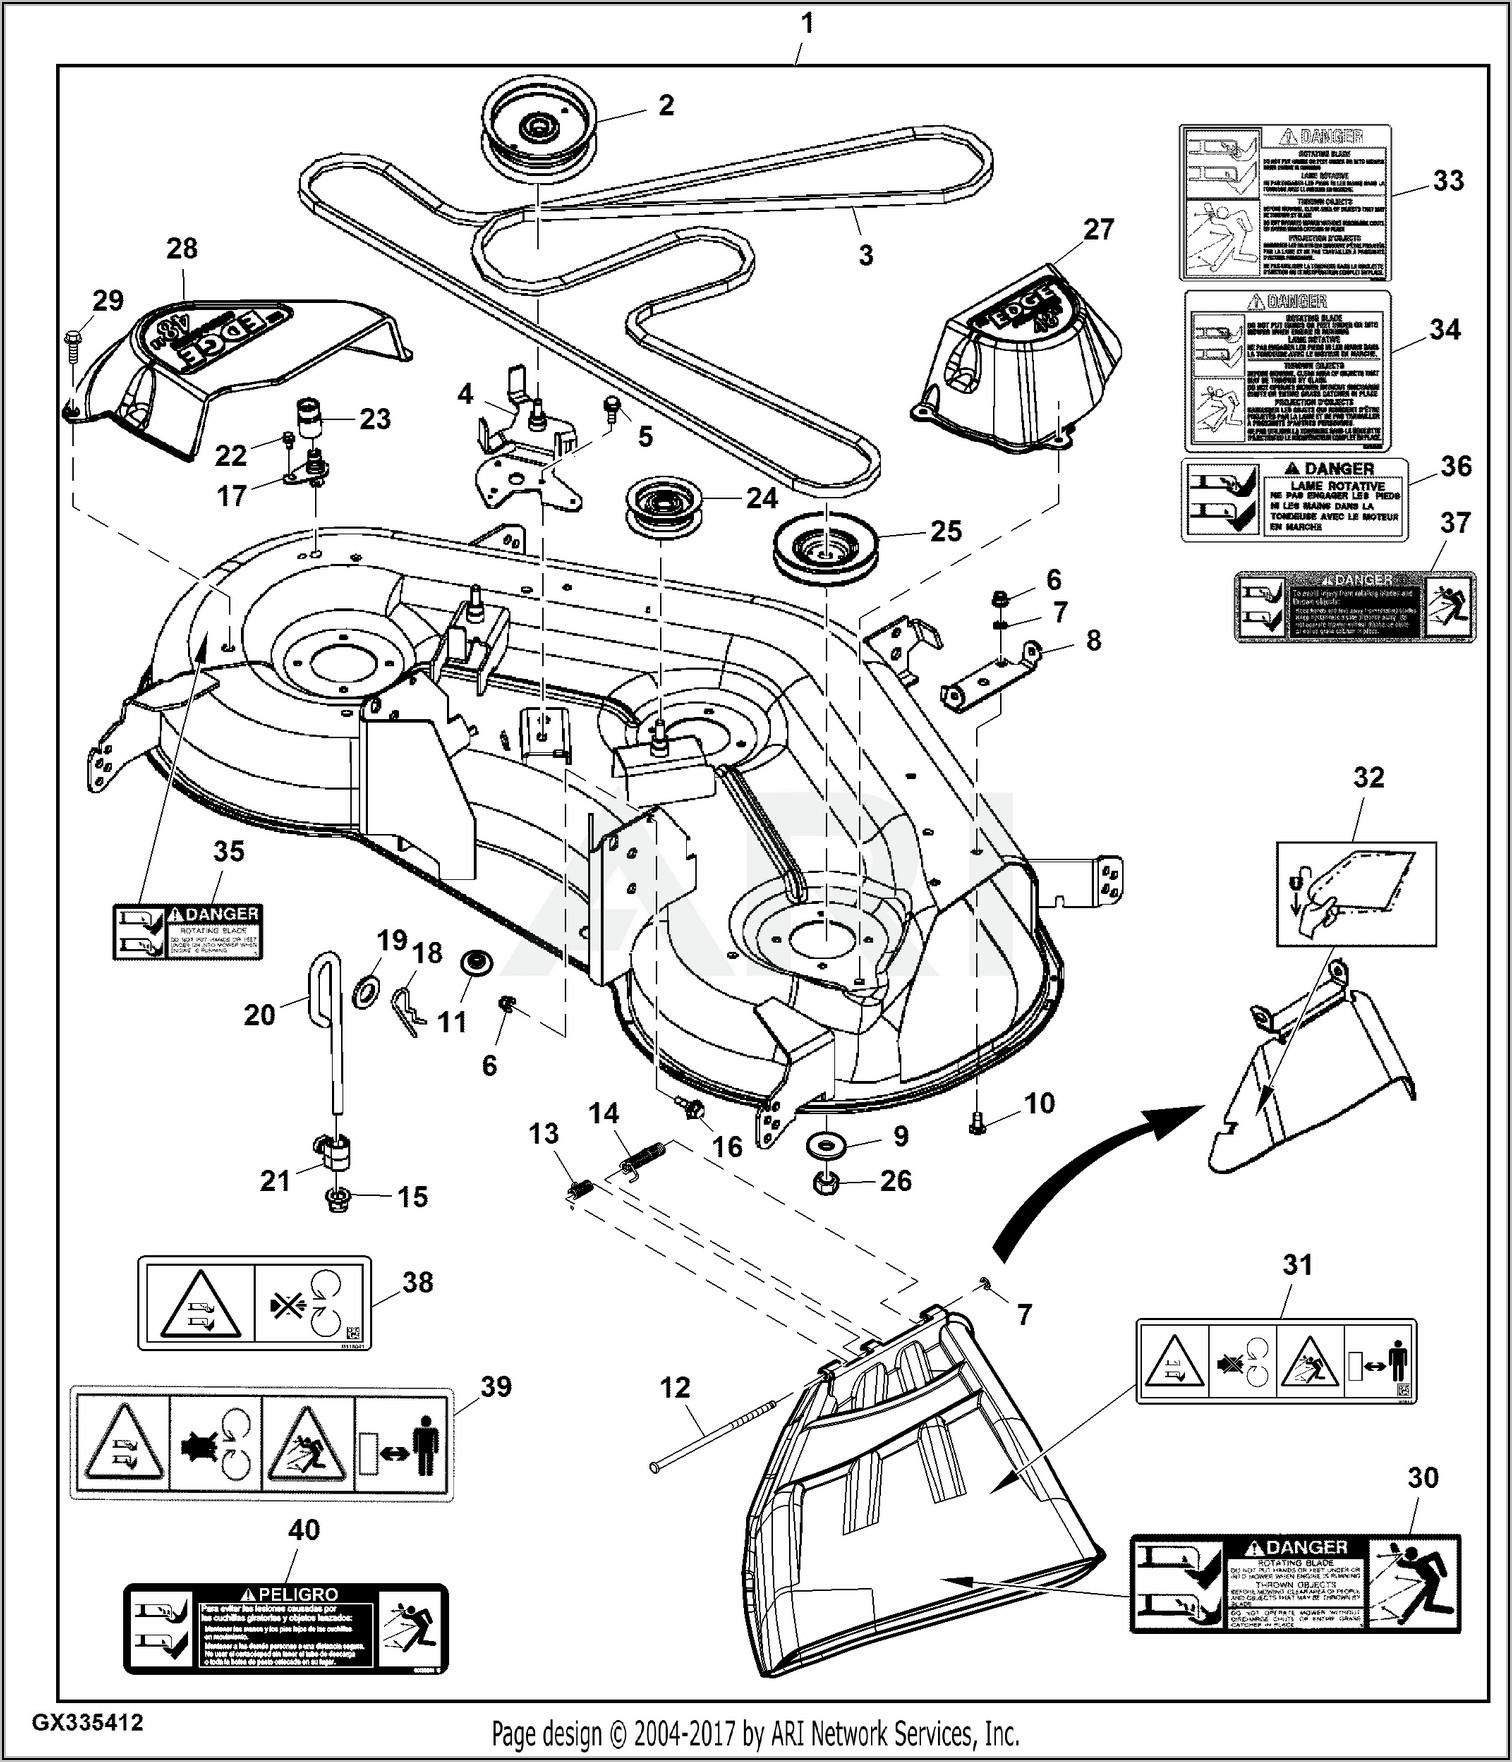 John Deere L120 48 Inch Deck Belt Routing